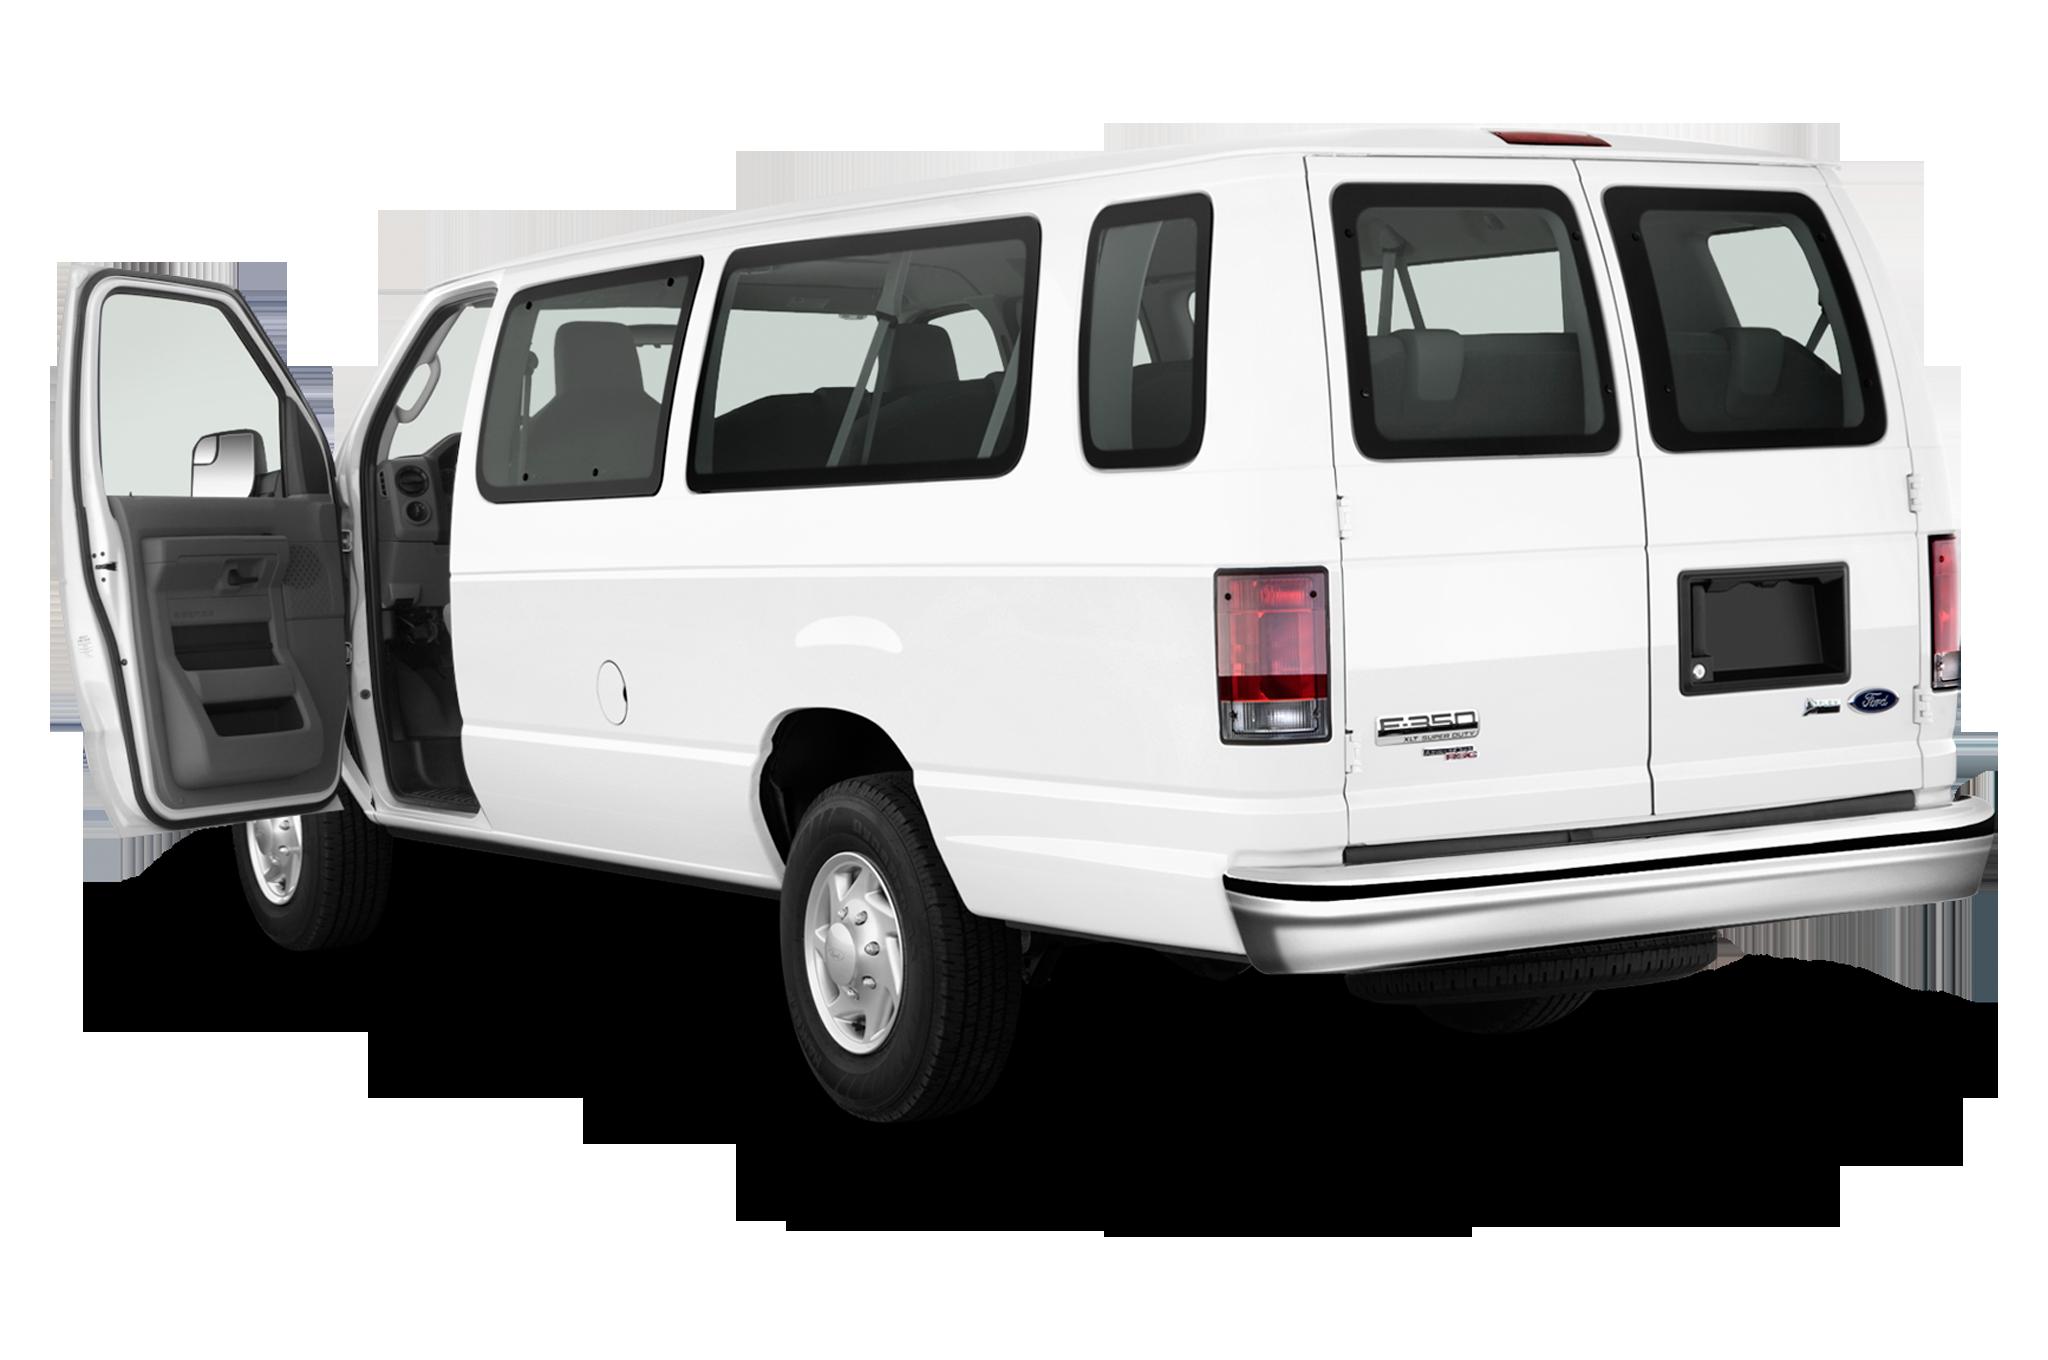 Ford Replacing E Series Van with European Transit